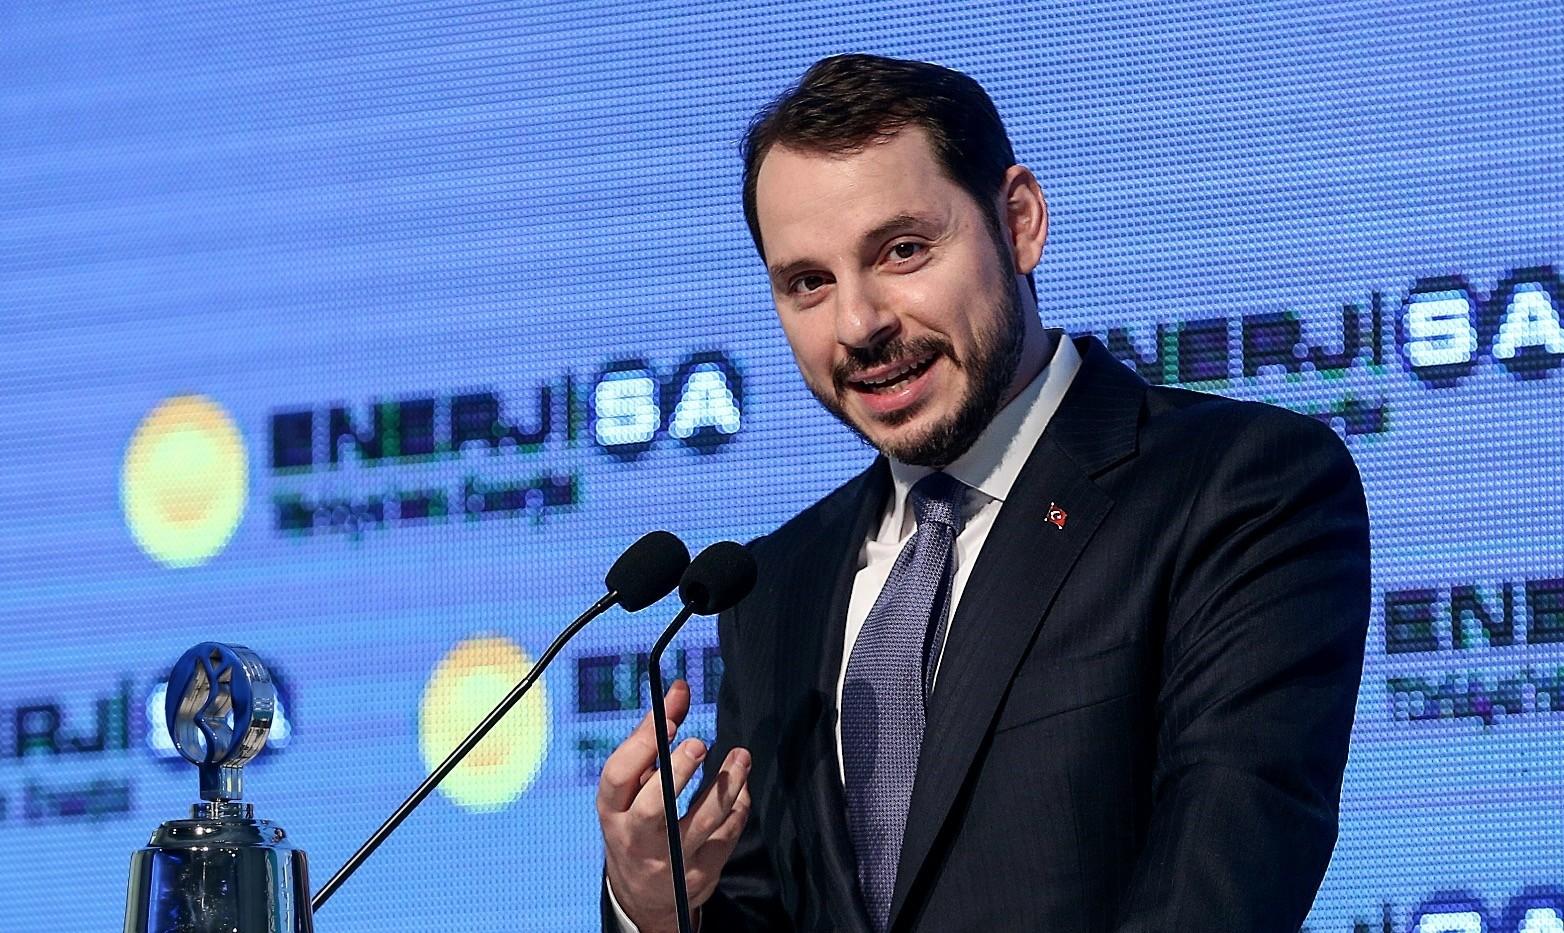 Energy Minister Albayrak speaks at the public offering ceremony of Turkeyu2019s Enerjisa at the Borsa Istanbul, Feb. 8.